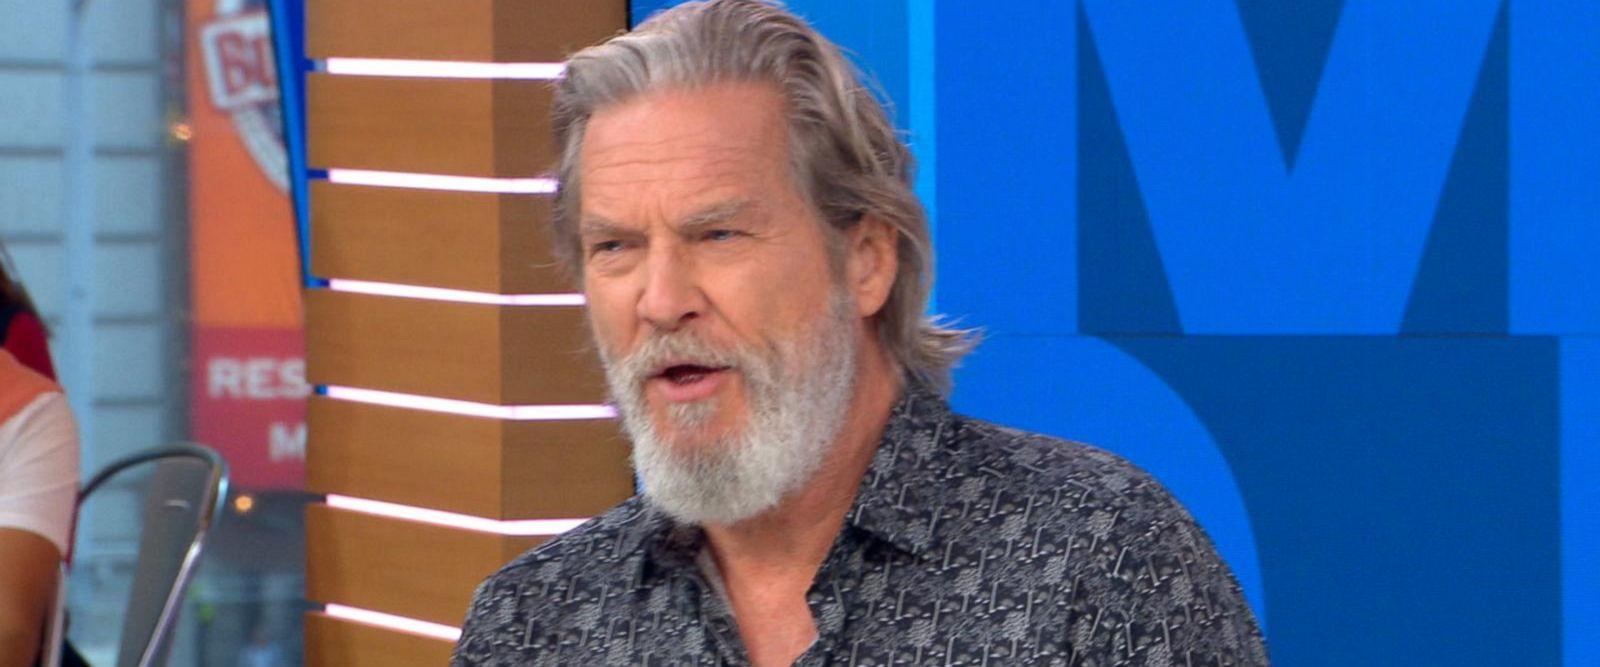 VIDEO: Jeff Bridges opens up about 'Kingsman: The Golden Circle'